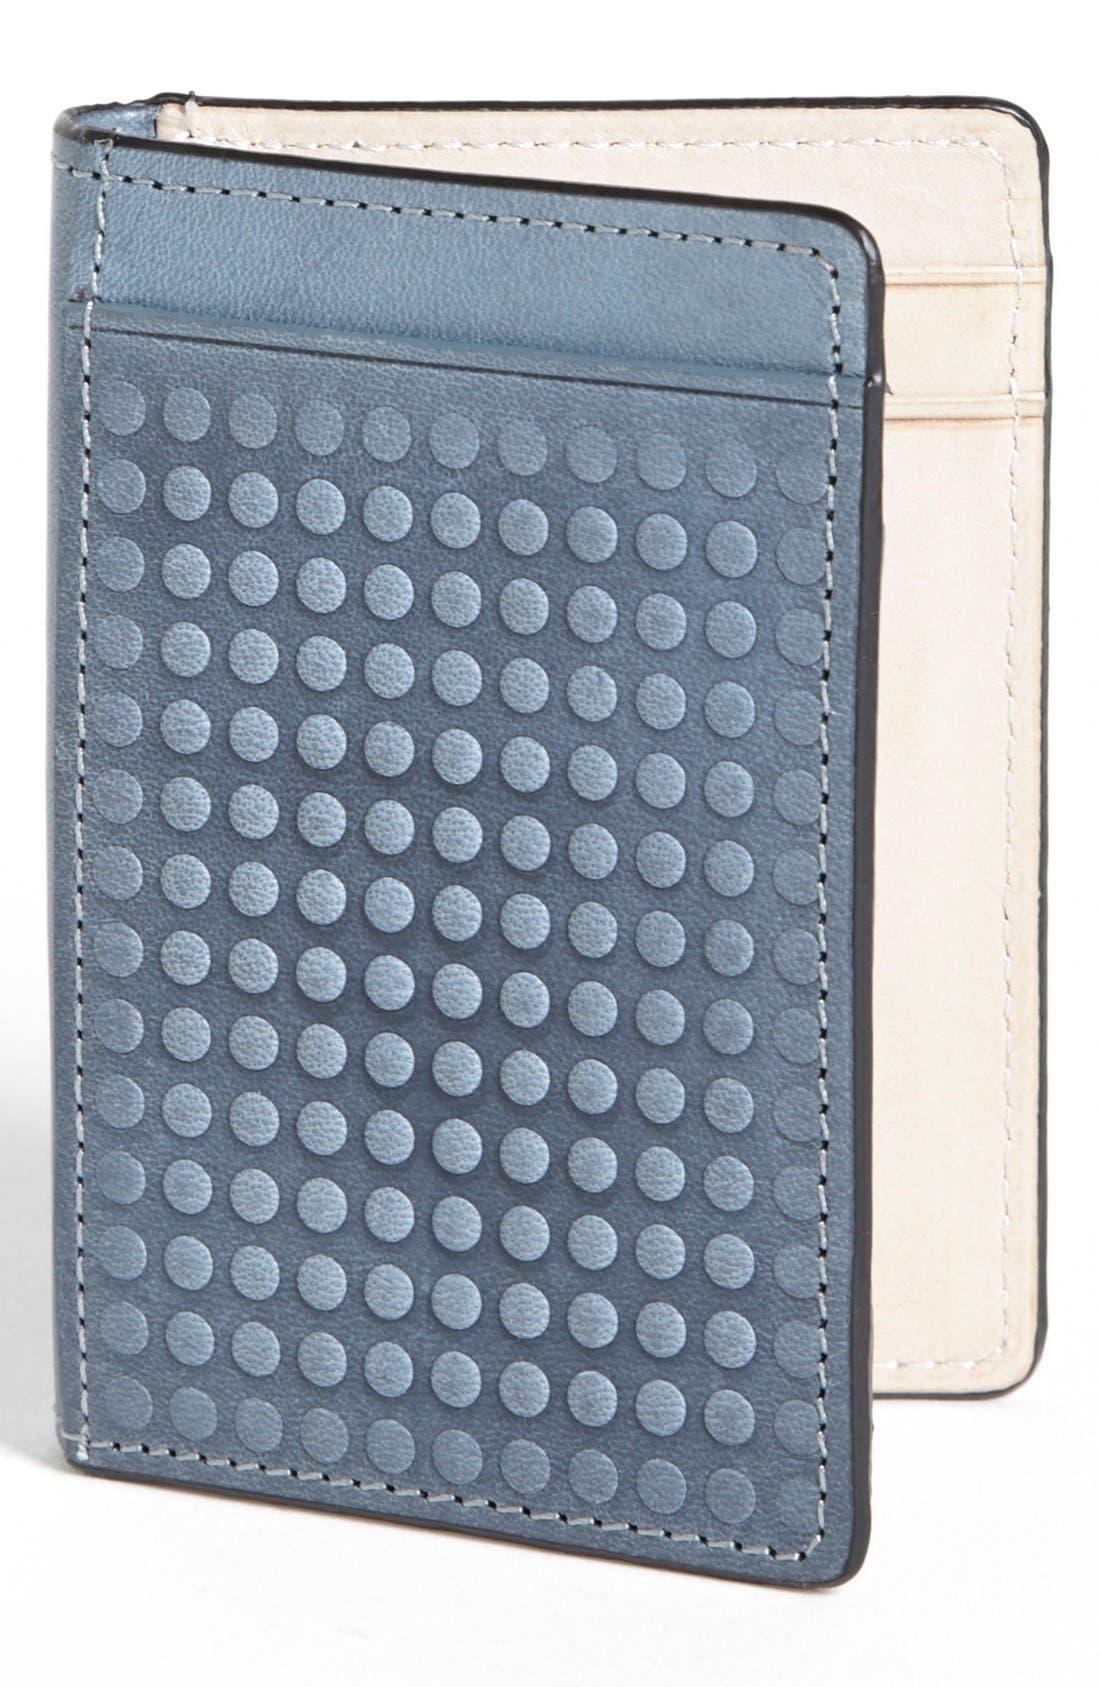 Main Image - J Fold 'Altrus' Folding Card Holder